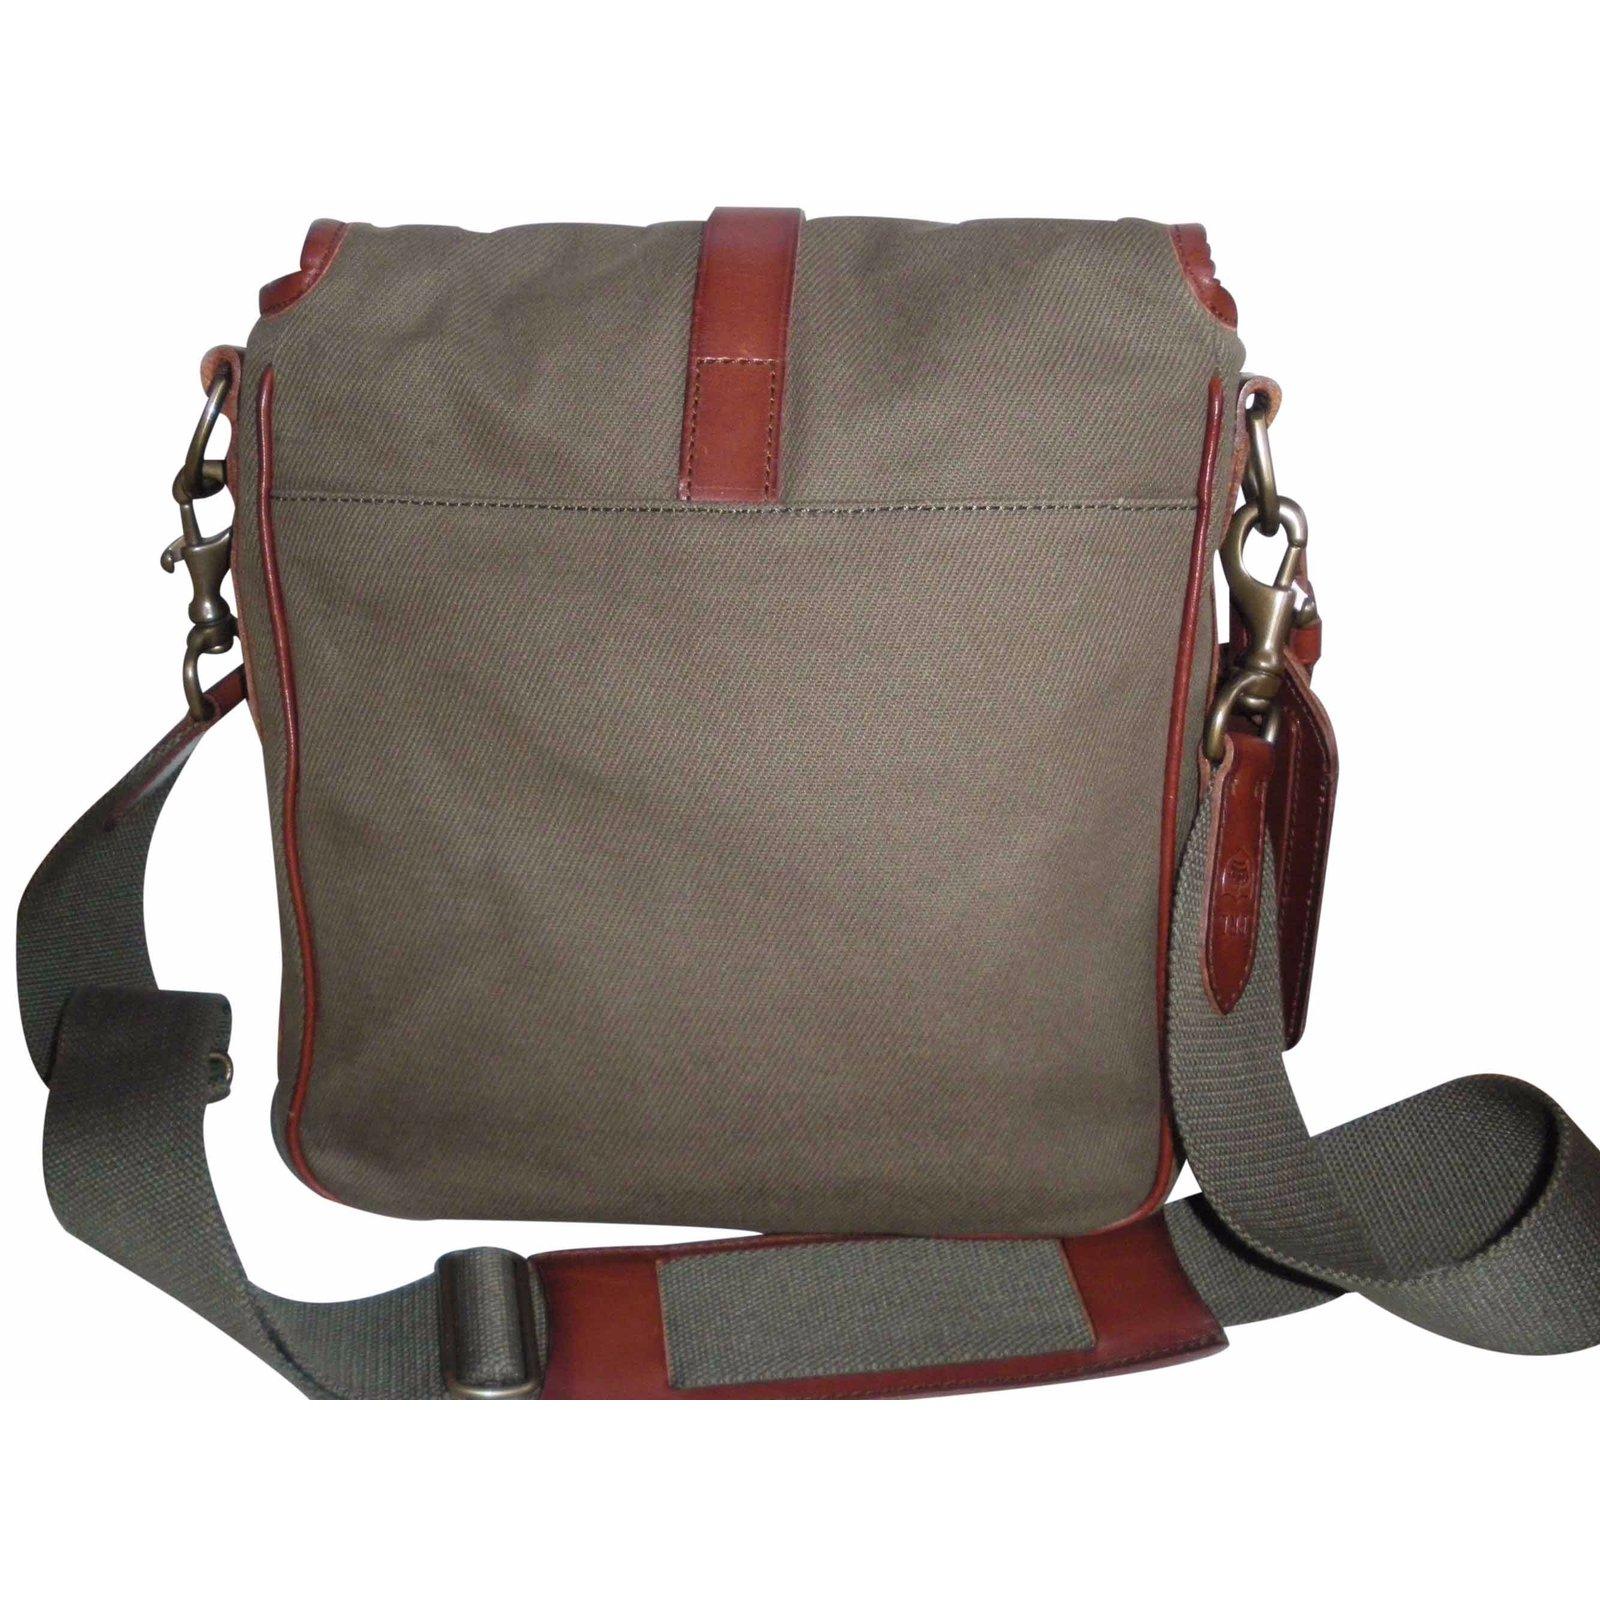 c7770aba3410 Polo Ralph Lauren Handbag Handbags Cloth Khaki ref.22309 - Joli Closet